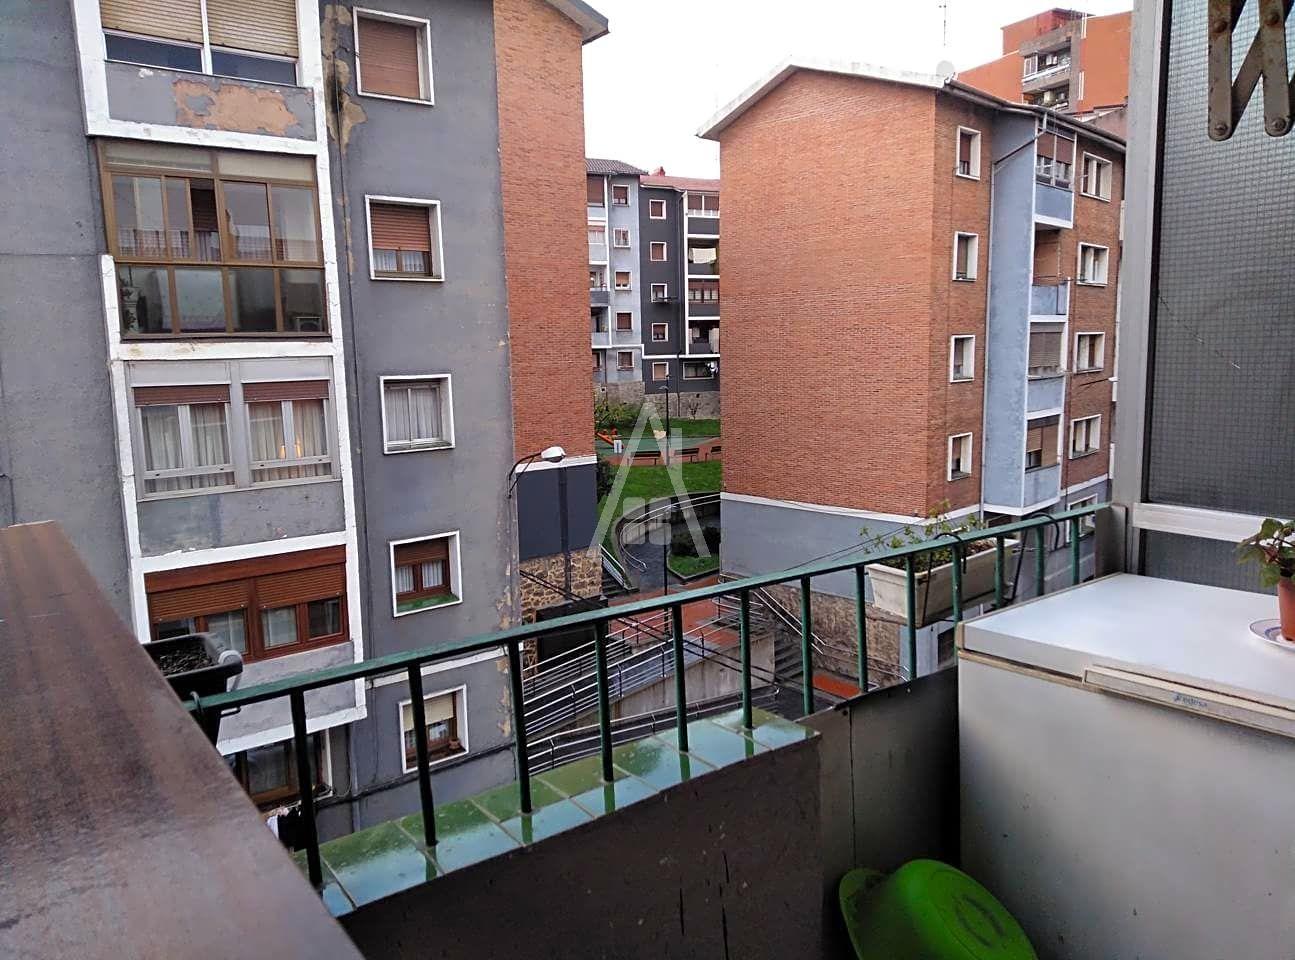 Inmobiliaria avenida piso en venta en basauri de 69 m2 - Inmobiliarias en basauri ...